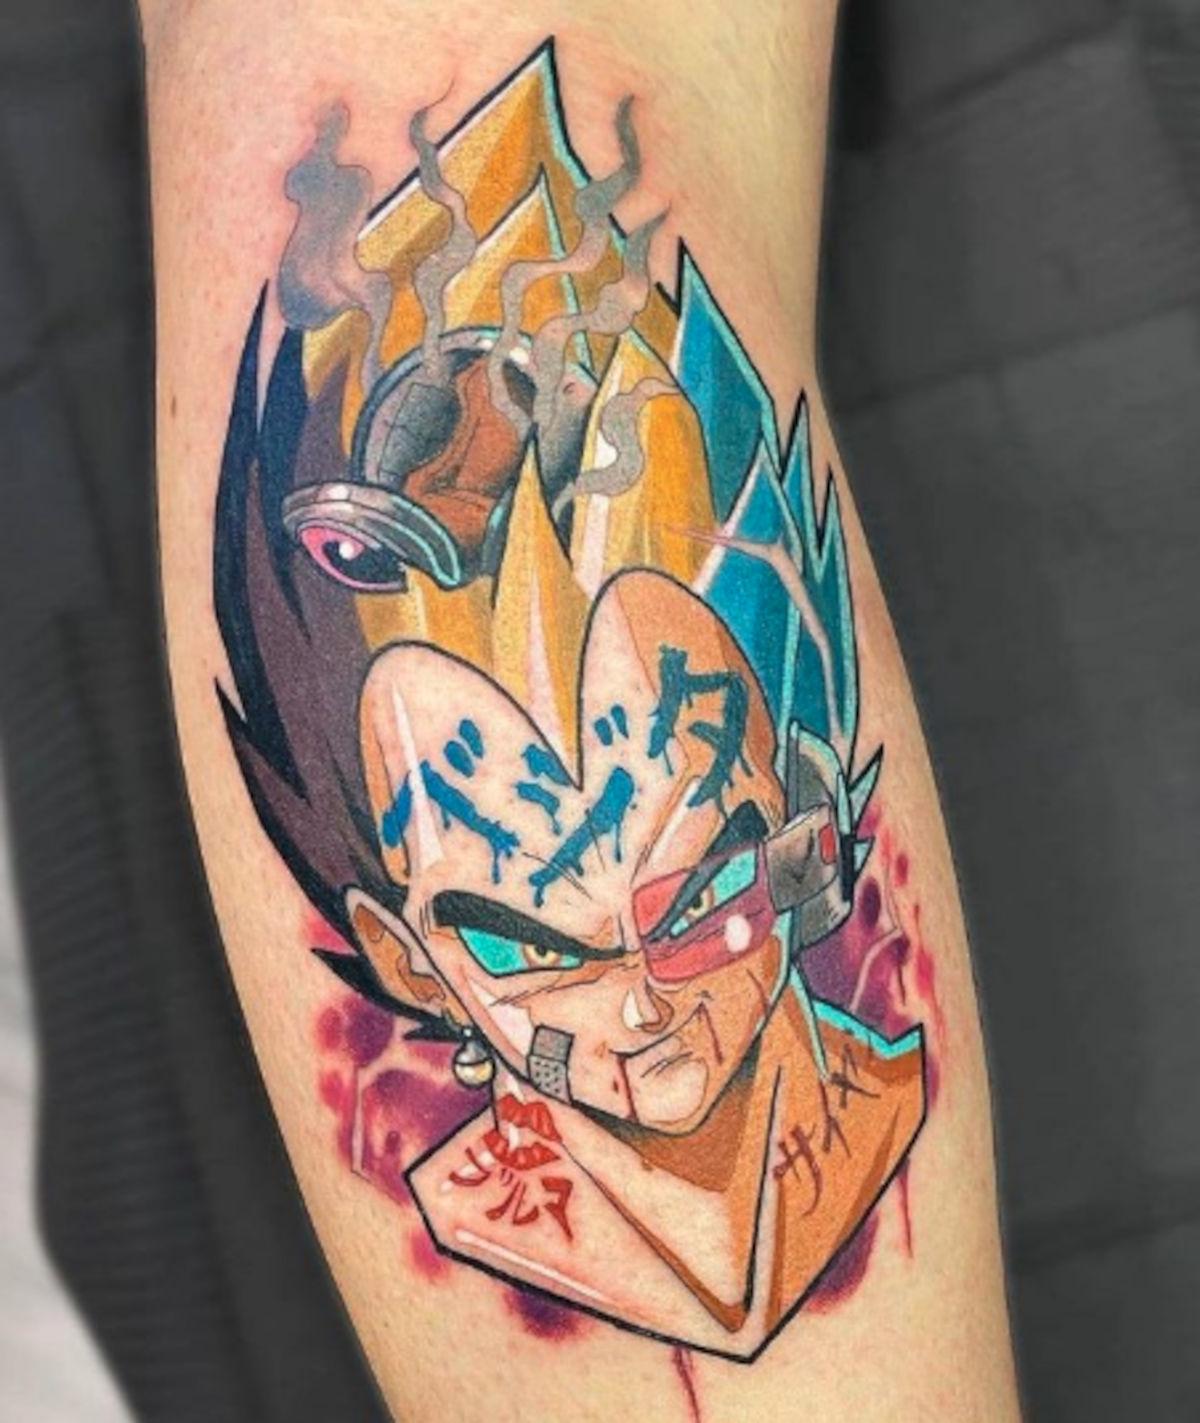 Vegeta de Dragon Ball consigue espectacular tatuaje